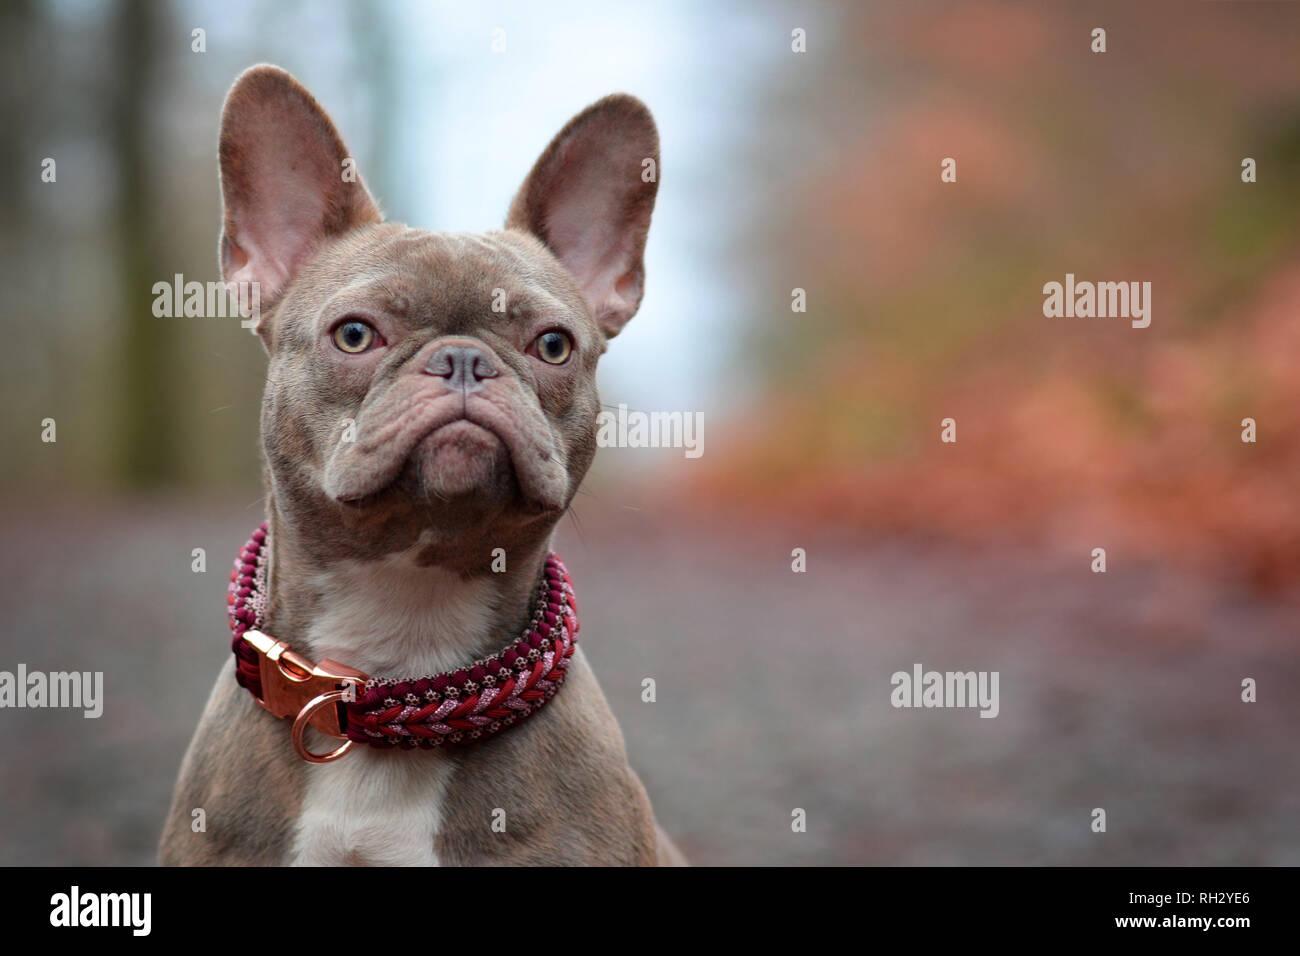 Beautiful Rare Colored Lilac Brindle Female French Bulldog